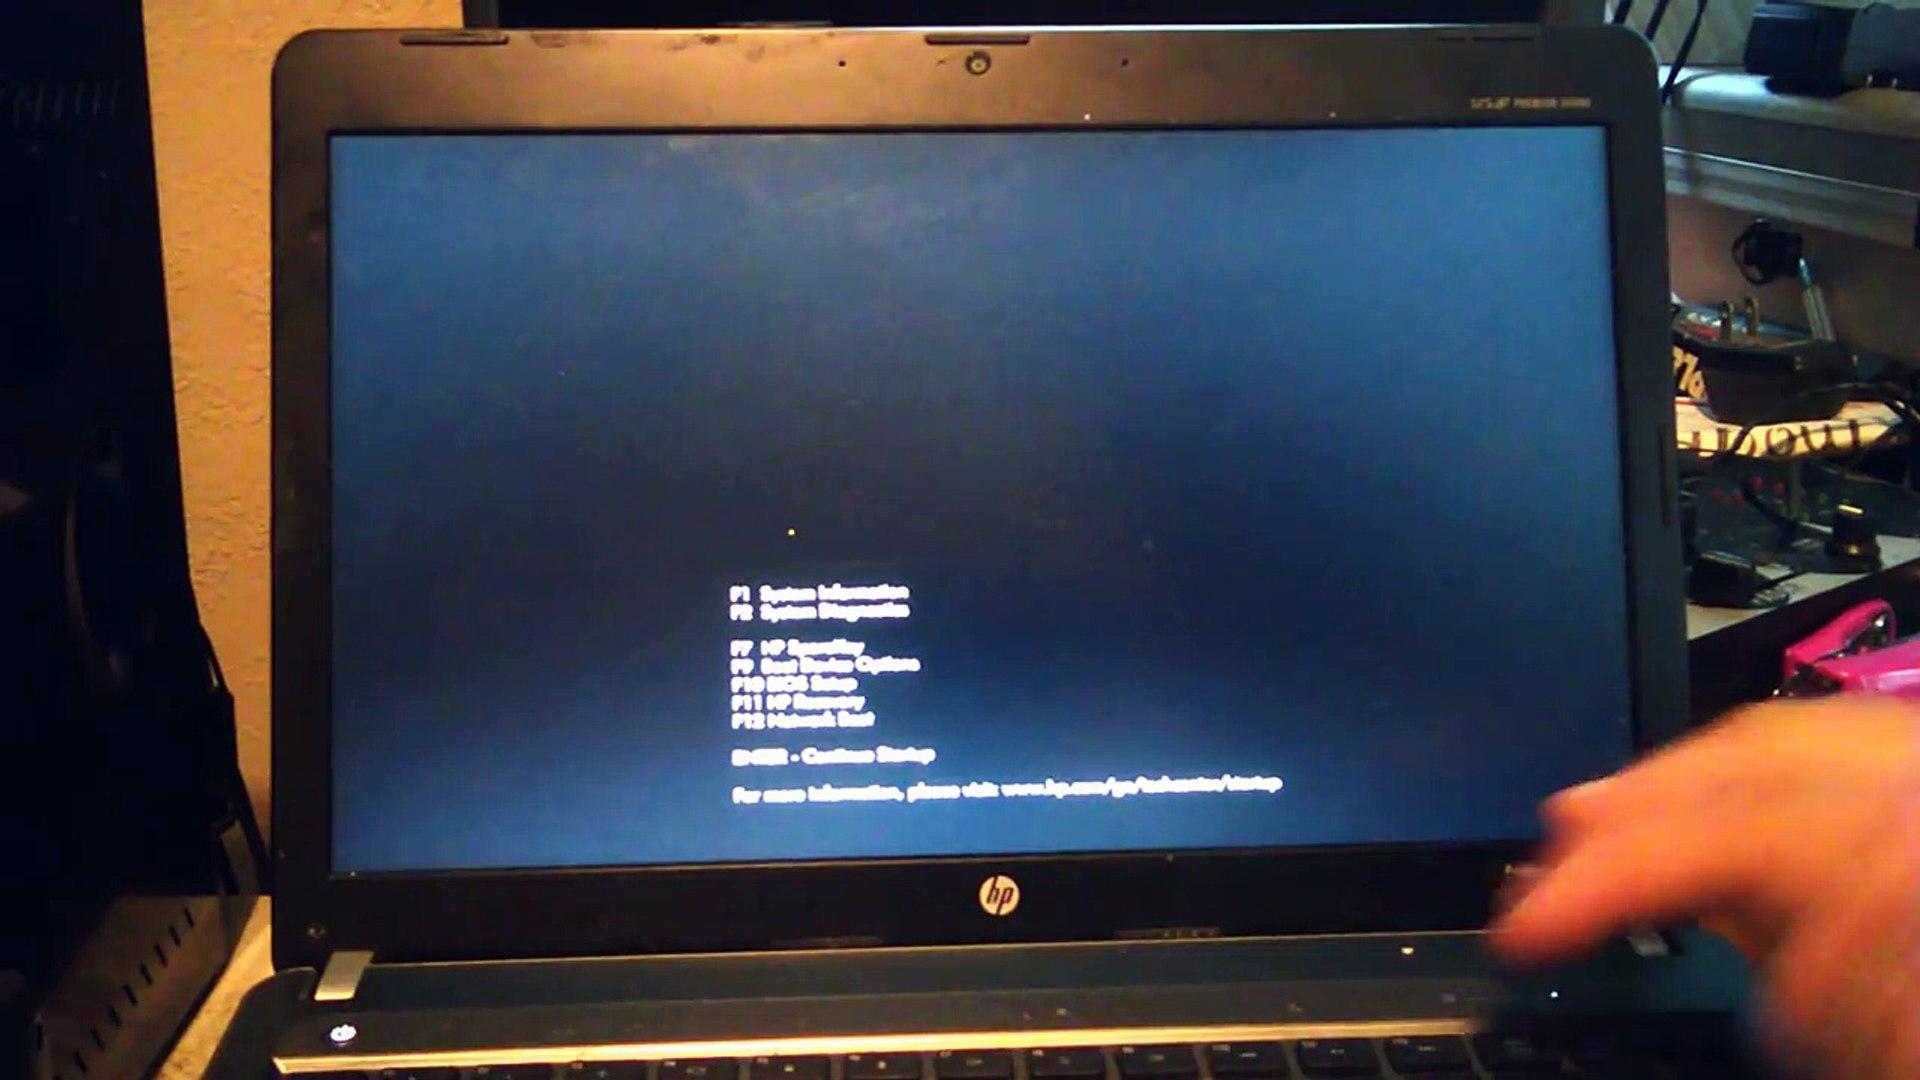 HP ProBook 30s Factory Reset For The Everest University Online Windows 30